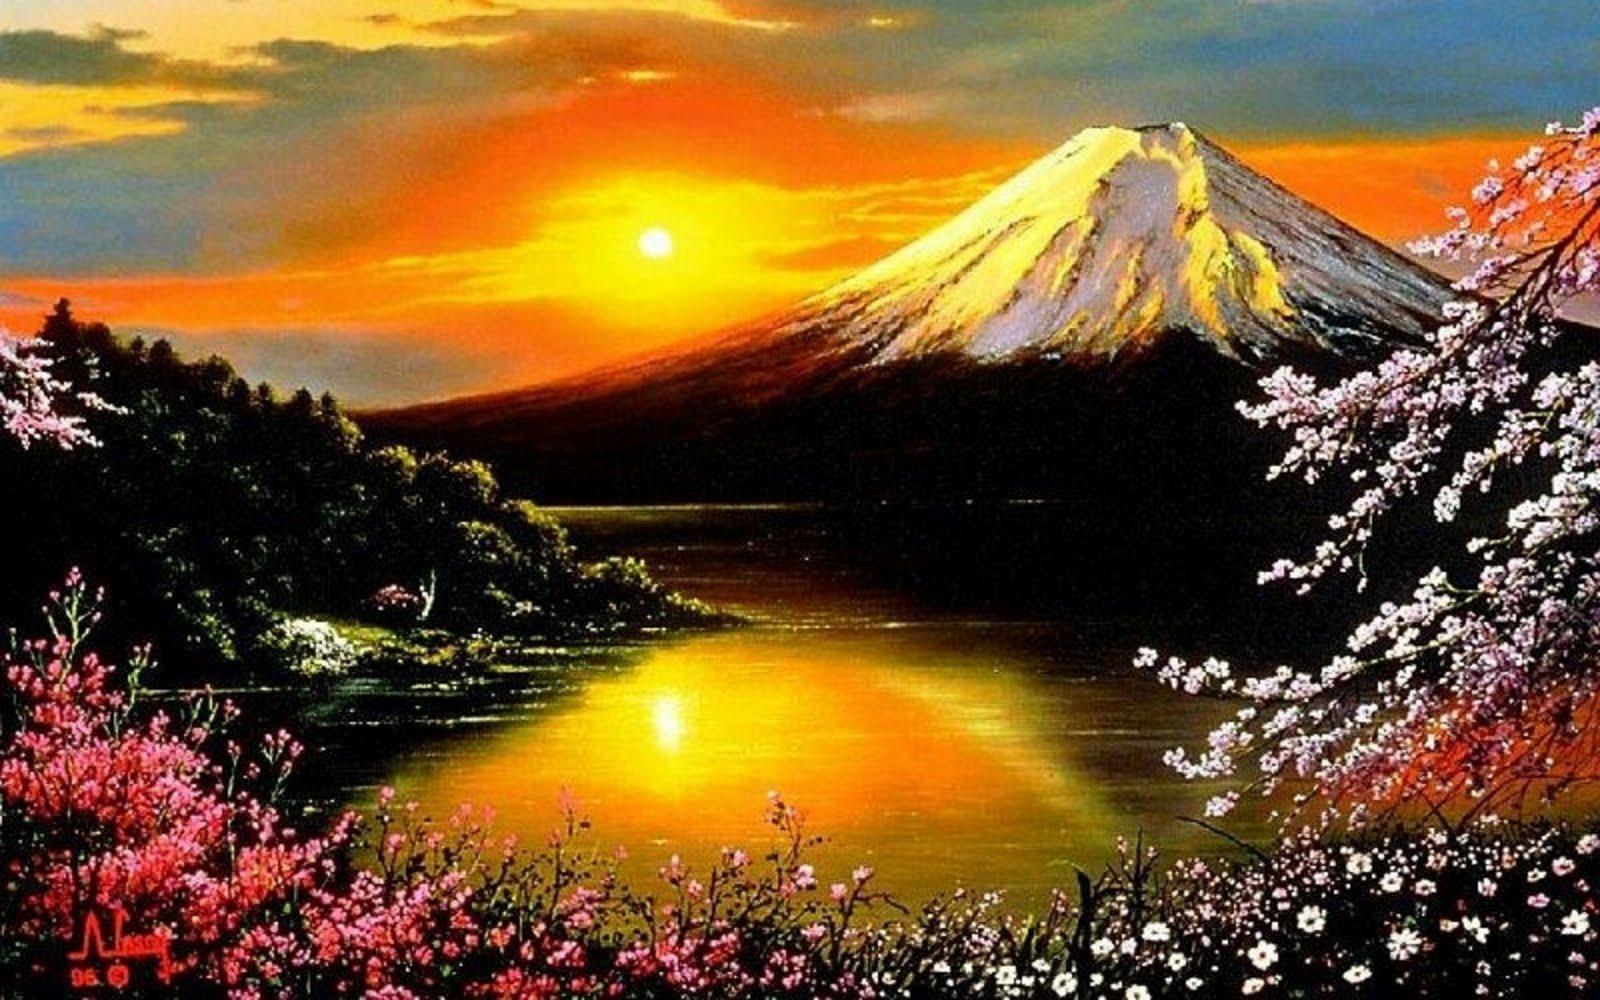 World Most Beautiful Nature Wallpaper - WallpaperSafari